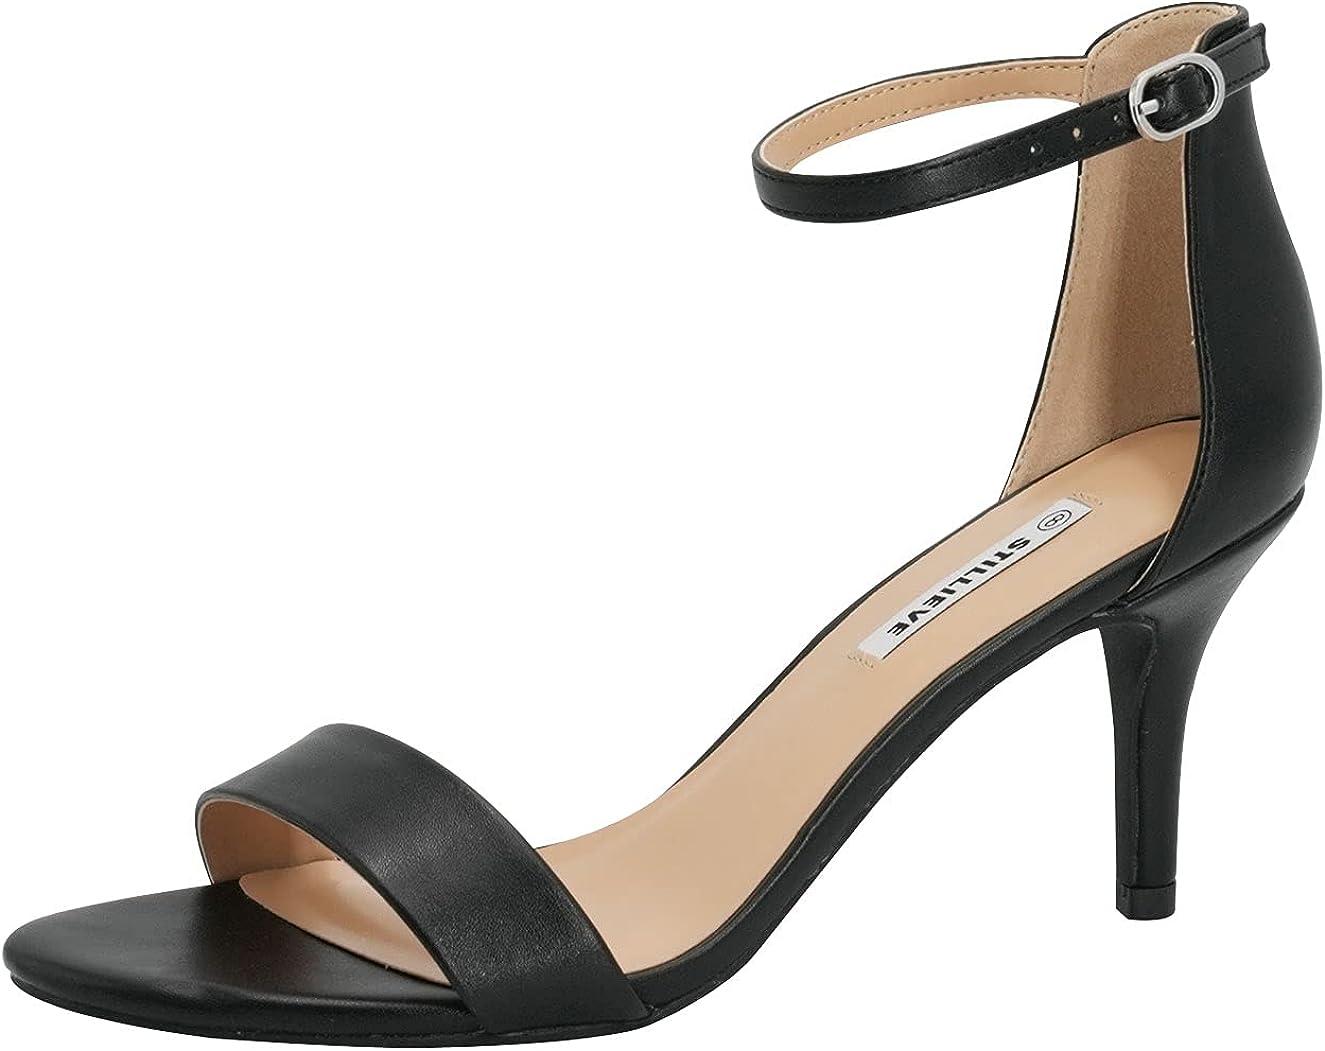 STILLIEVE Women's Ankle Strap Mid Stiletto Heel Sandal